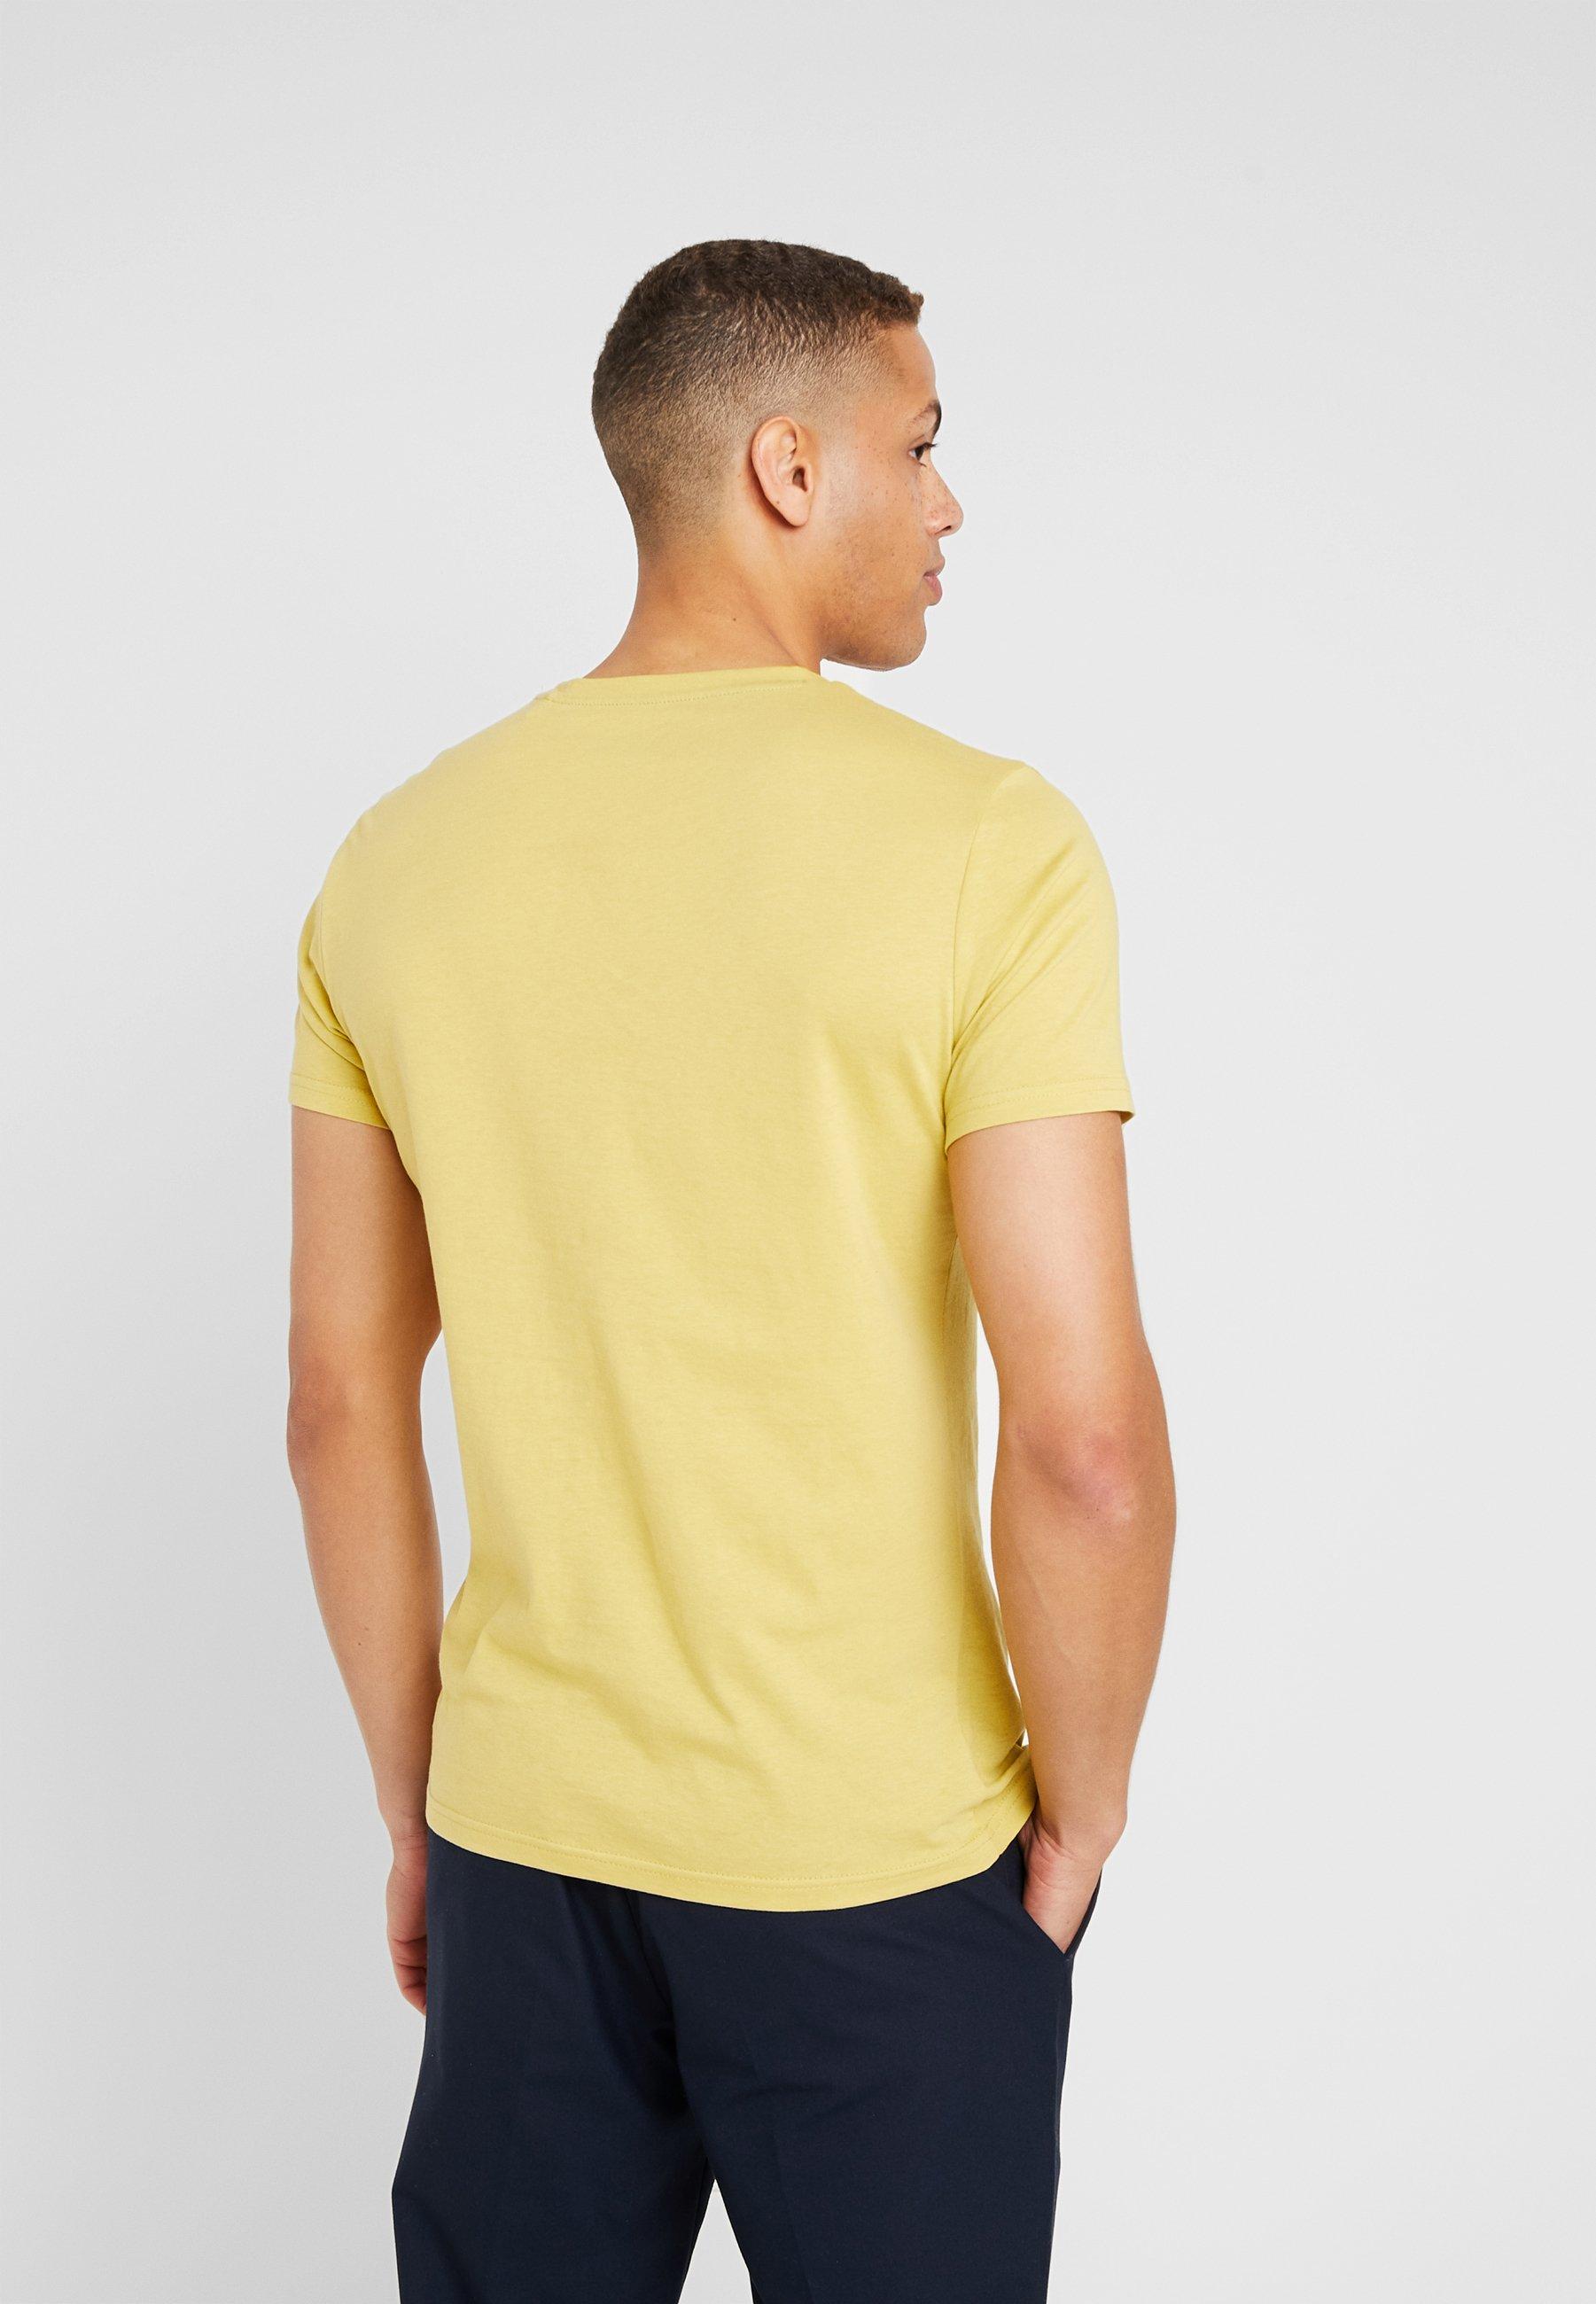 KurzarmT Imprimé By shirt Q Mustard s Designed Yellow OuPXTklwiZ